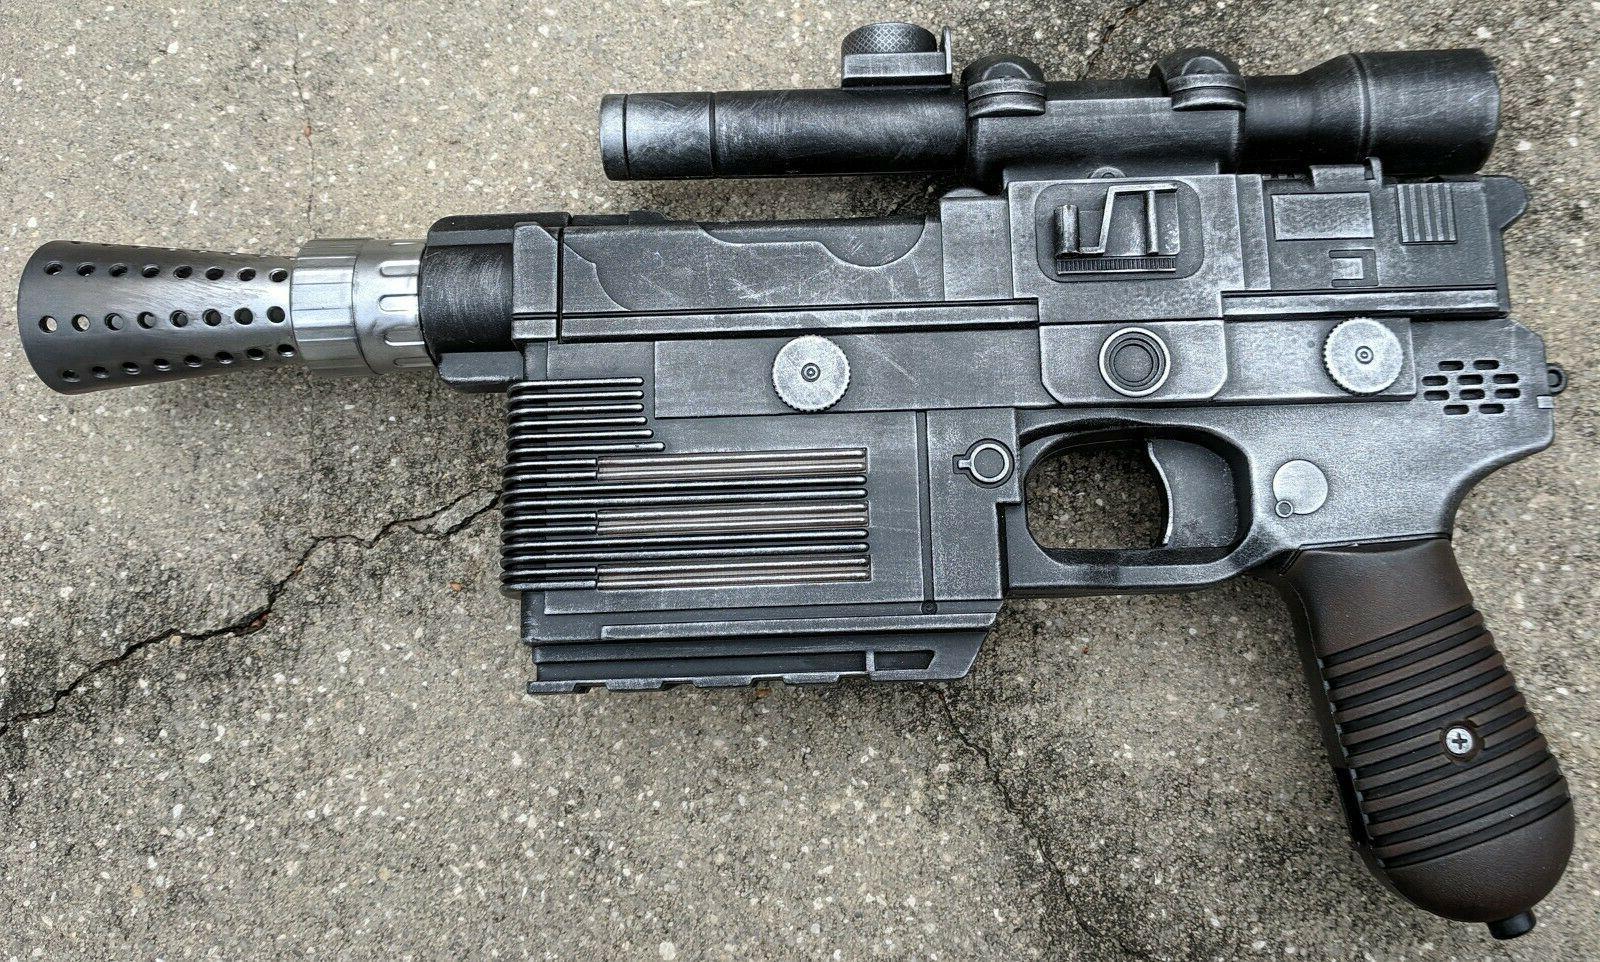 custom han solo dl 44 heavy blaster